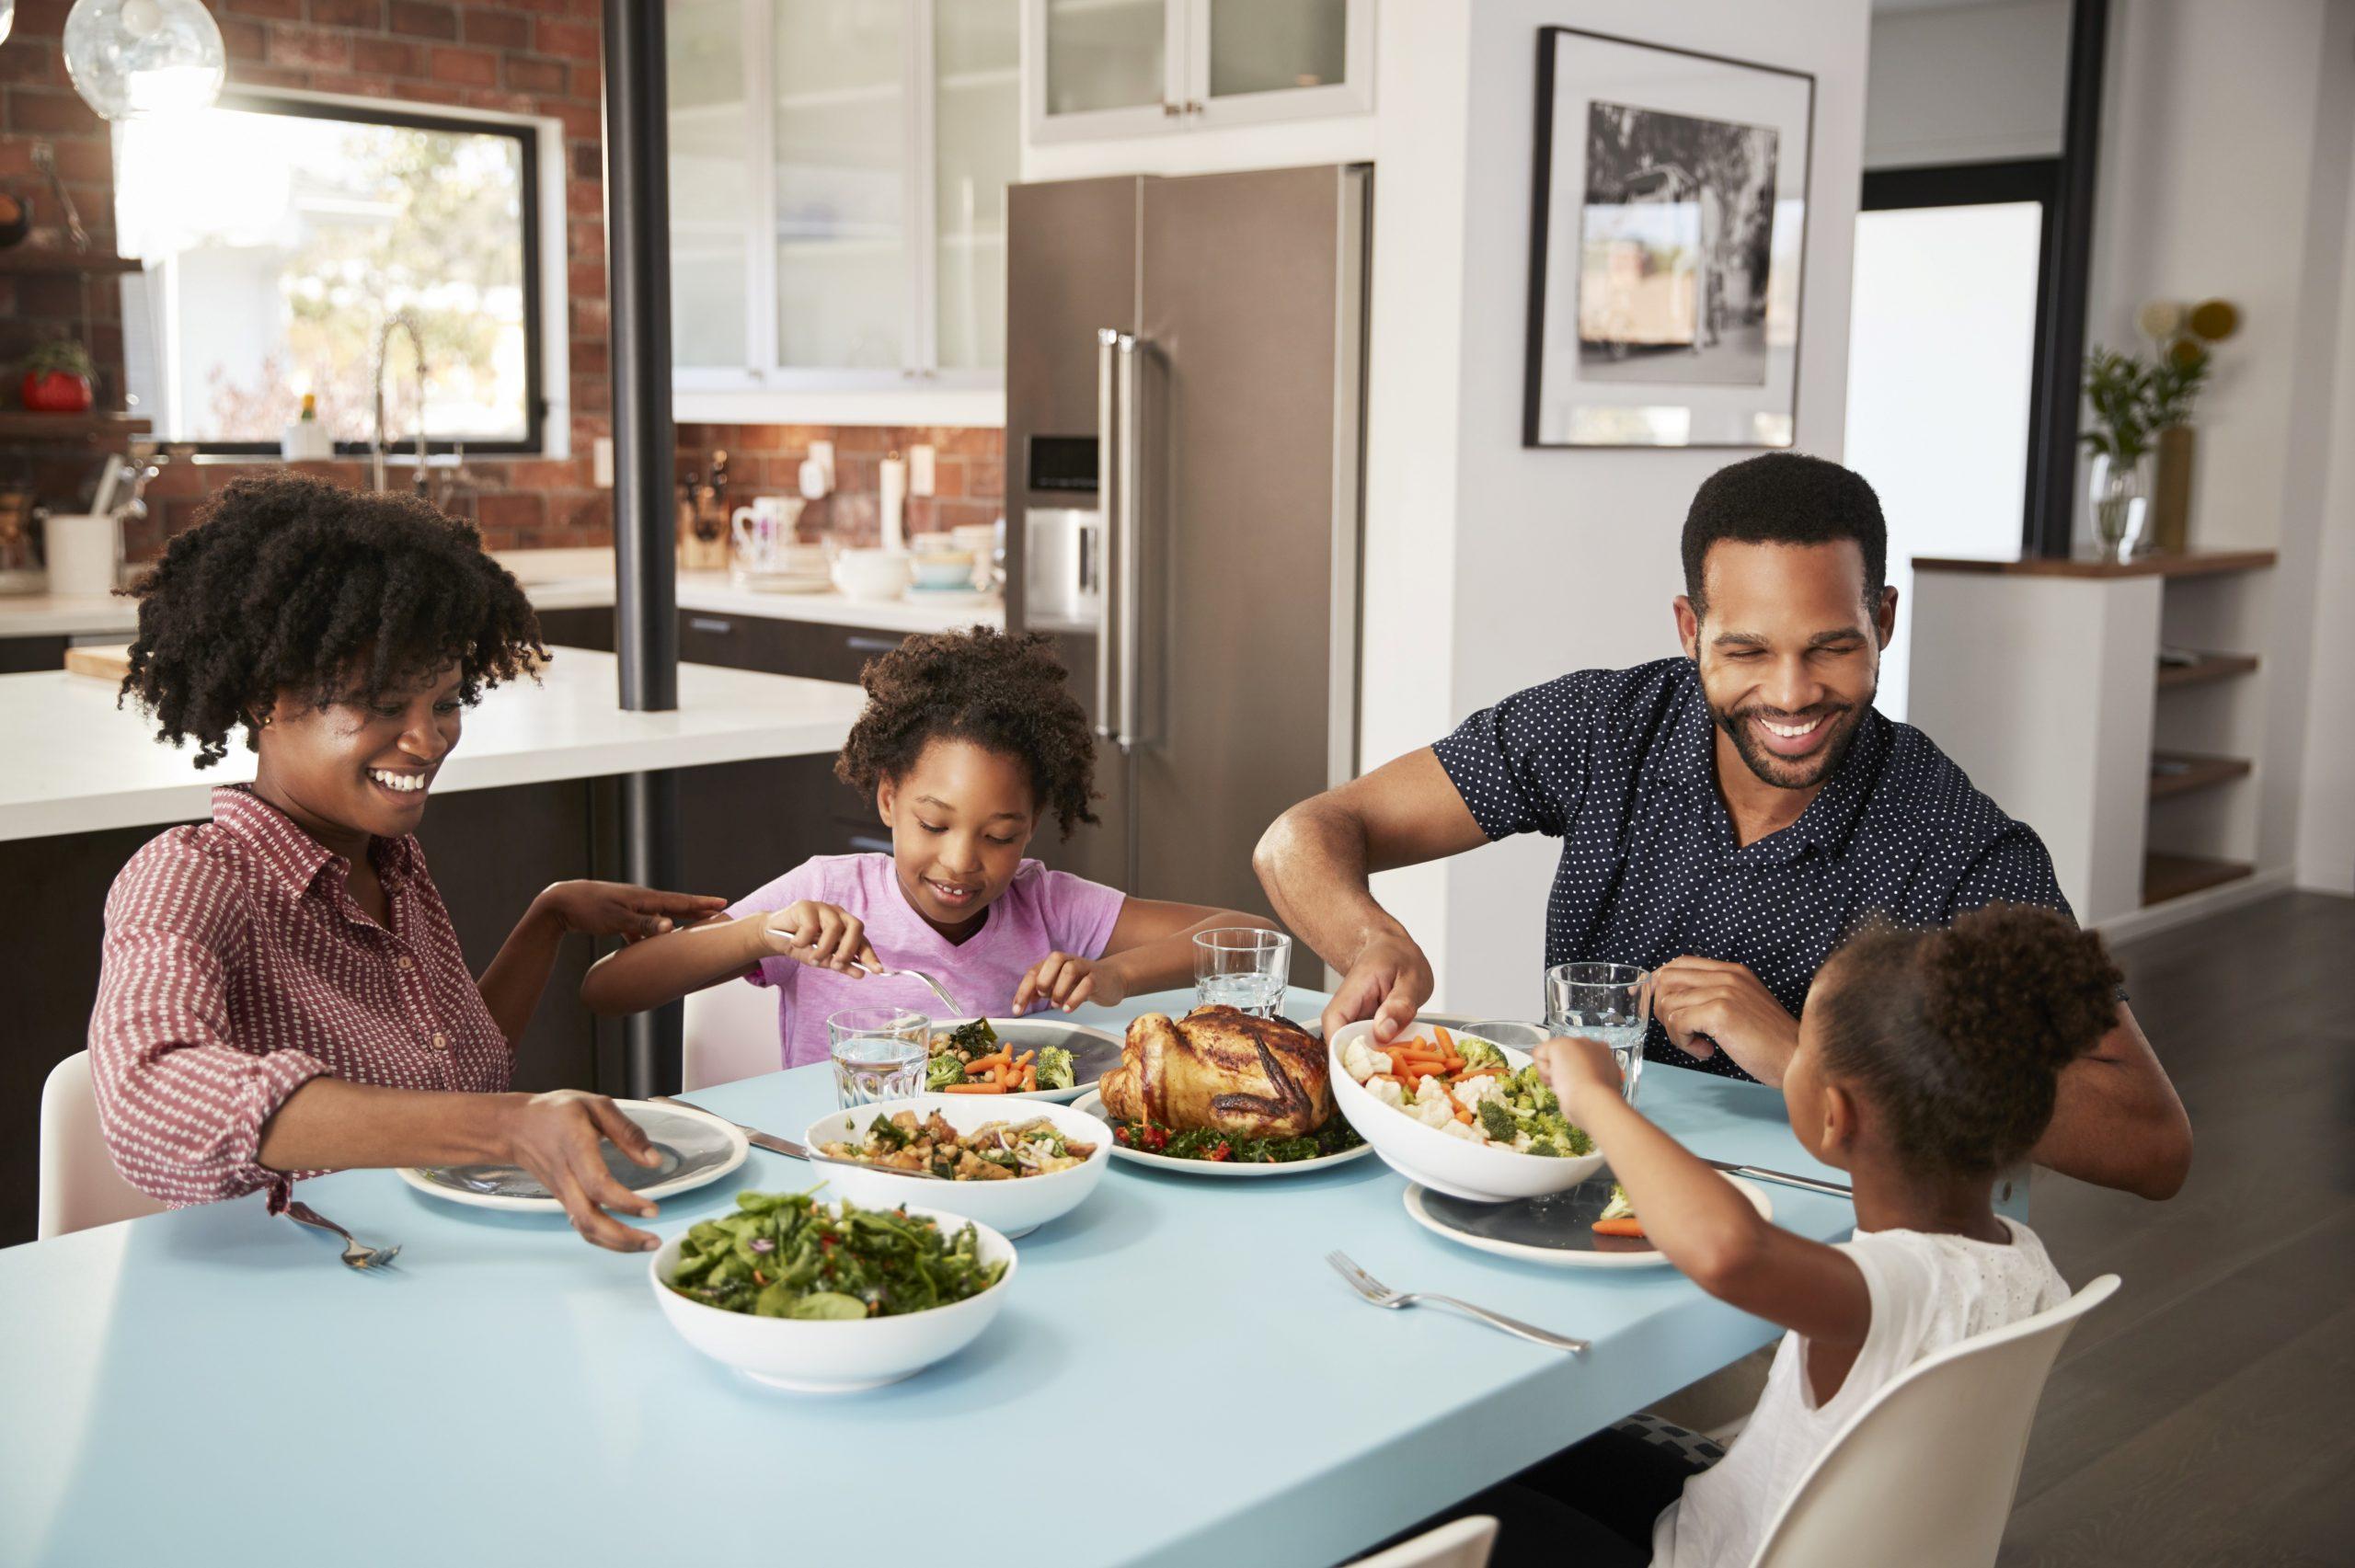 5 Tips for Better Family Meals